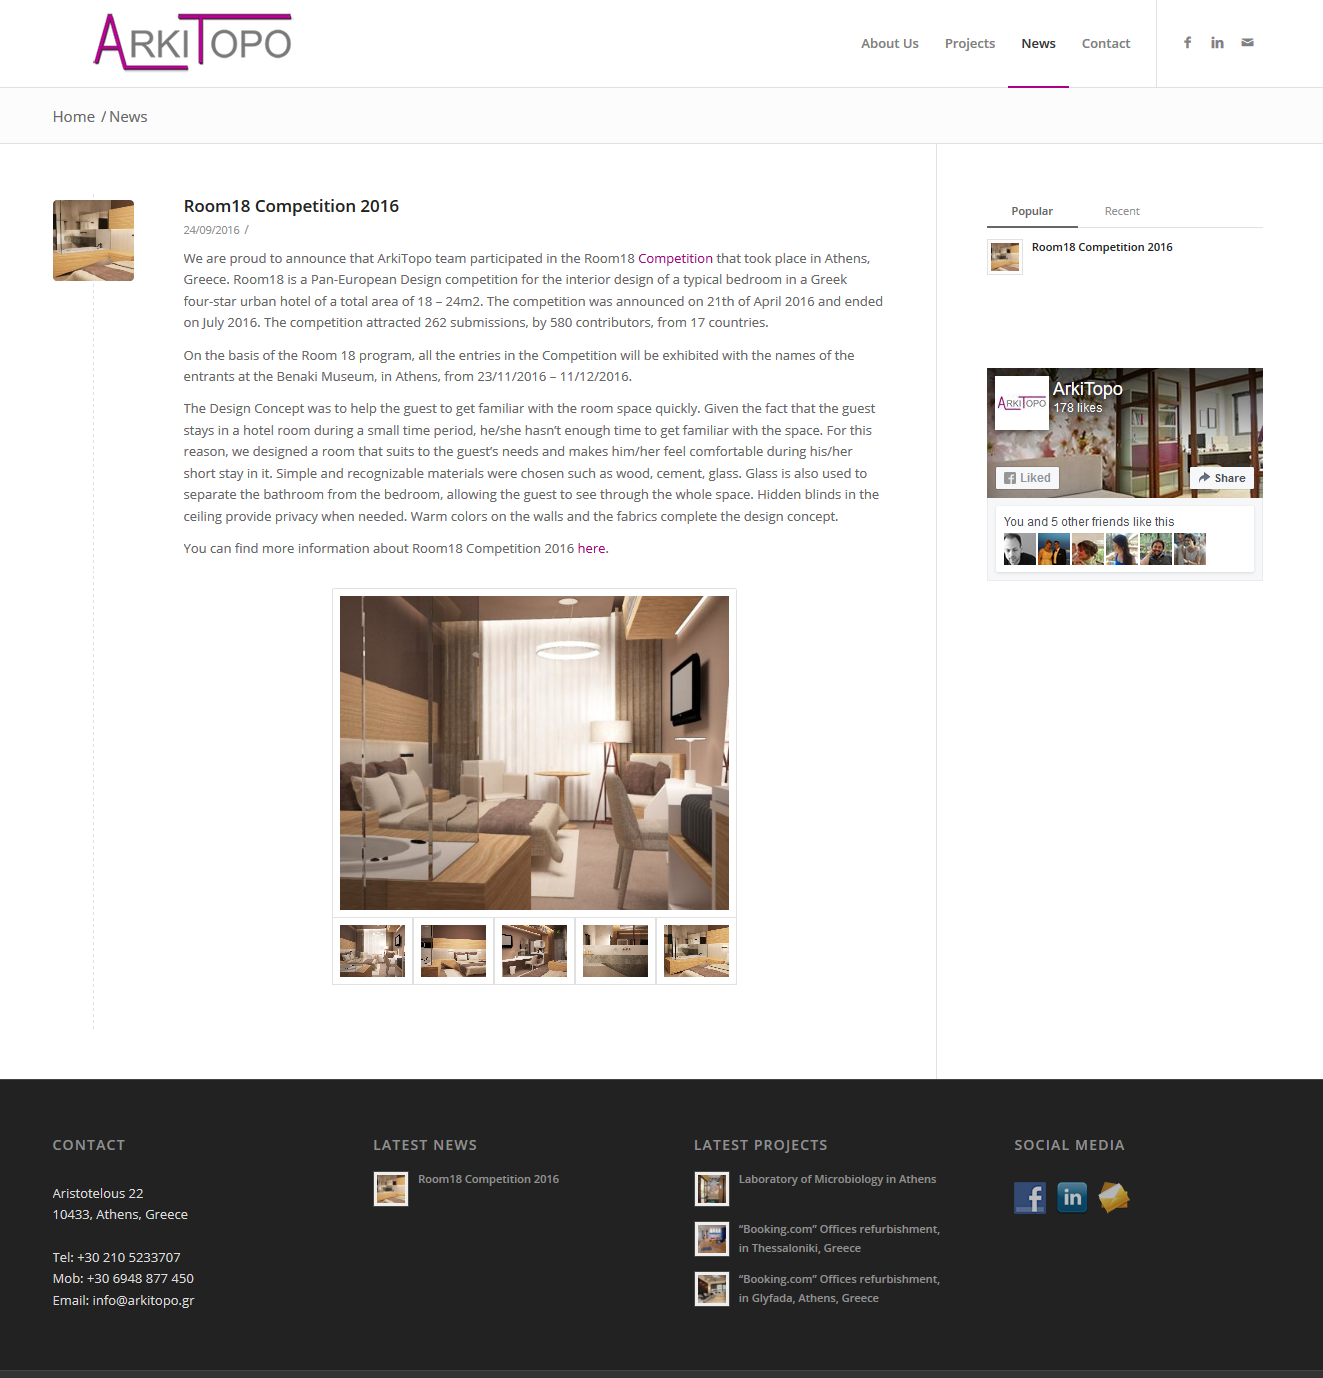 Project: Arki Topo - Innovative Frog - Web Design & Web Apps